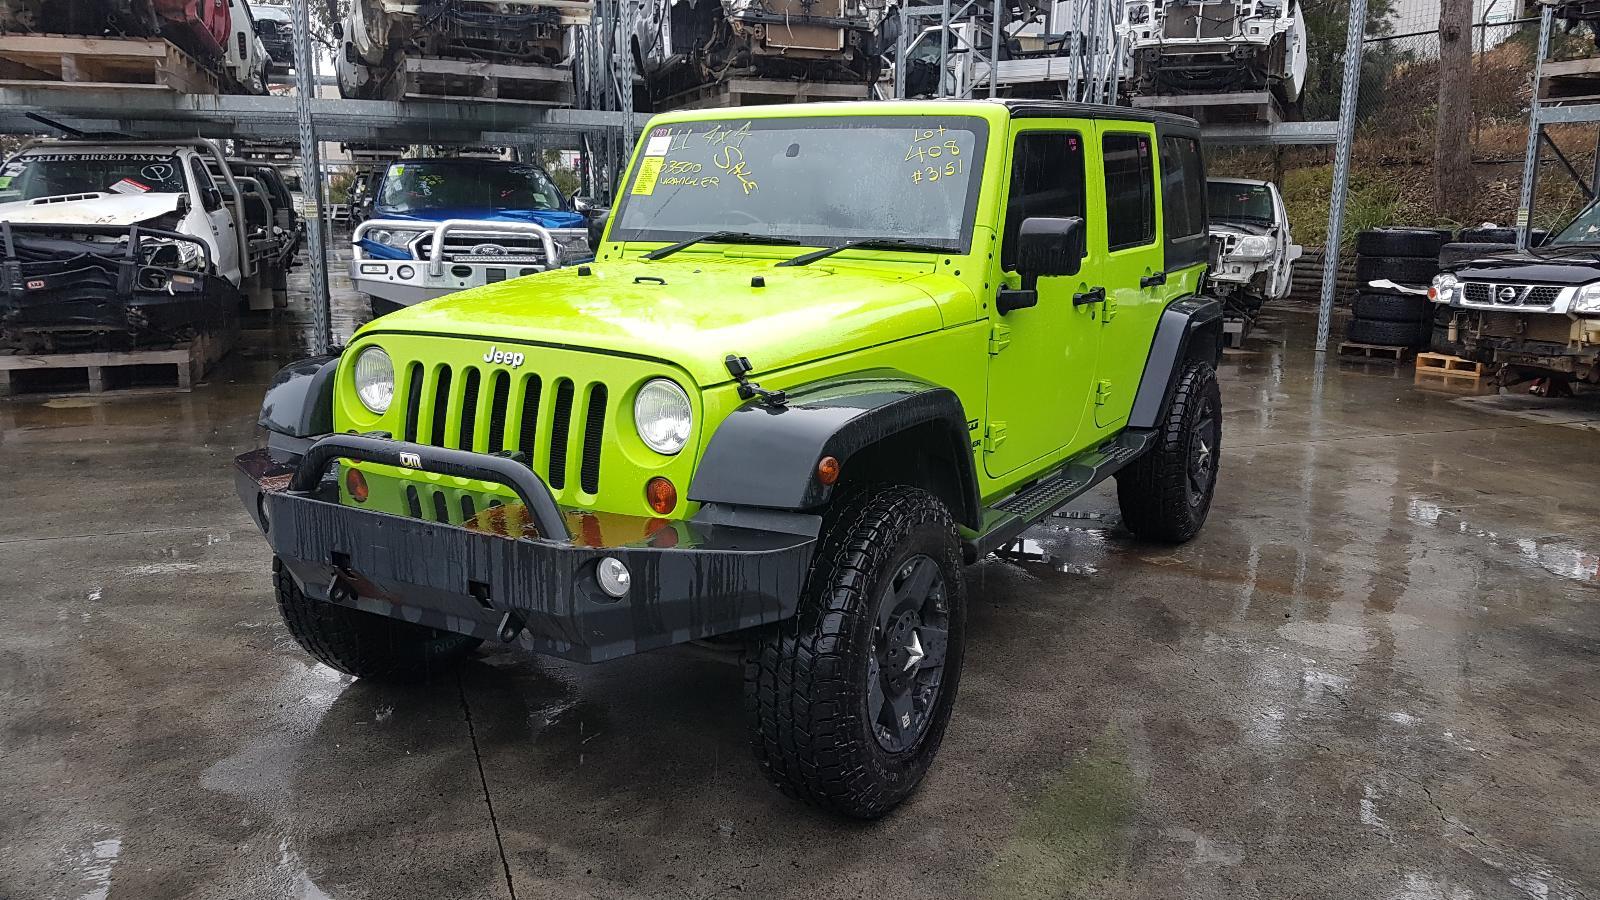 Image for a Jeep Wrangler 2012 4 Door Estate